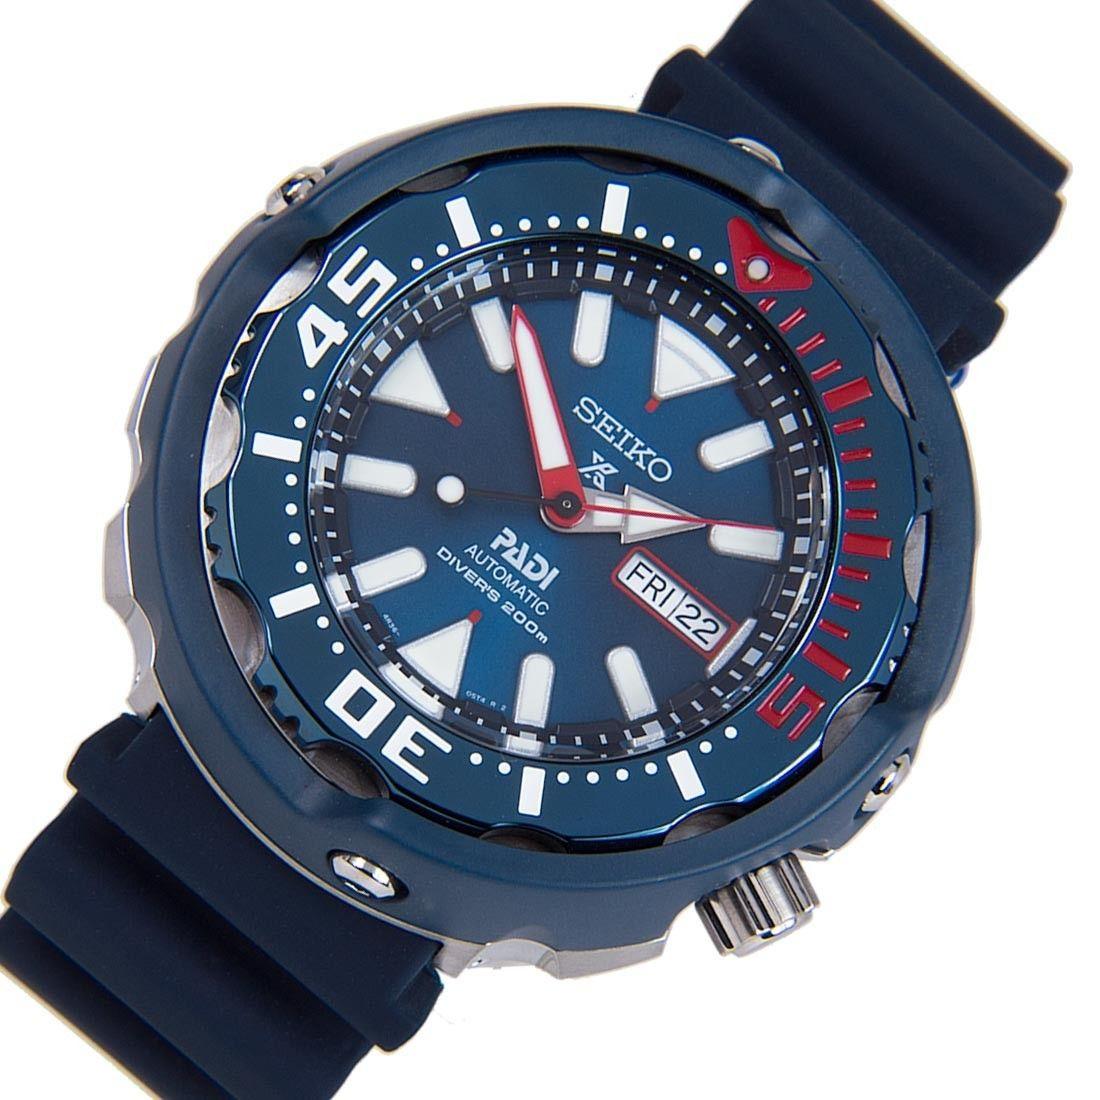 Srpa83k Srpa83 Seiko Padi Prospex Mechanical Lumibrite Hands Markers Rotating Bezel Divers Watch Seiko Seiko Diver Dive Watches